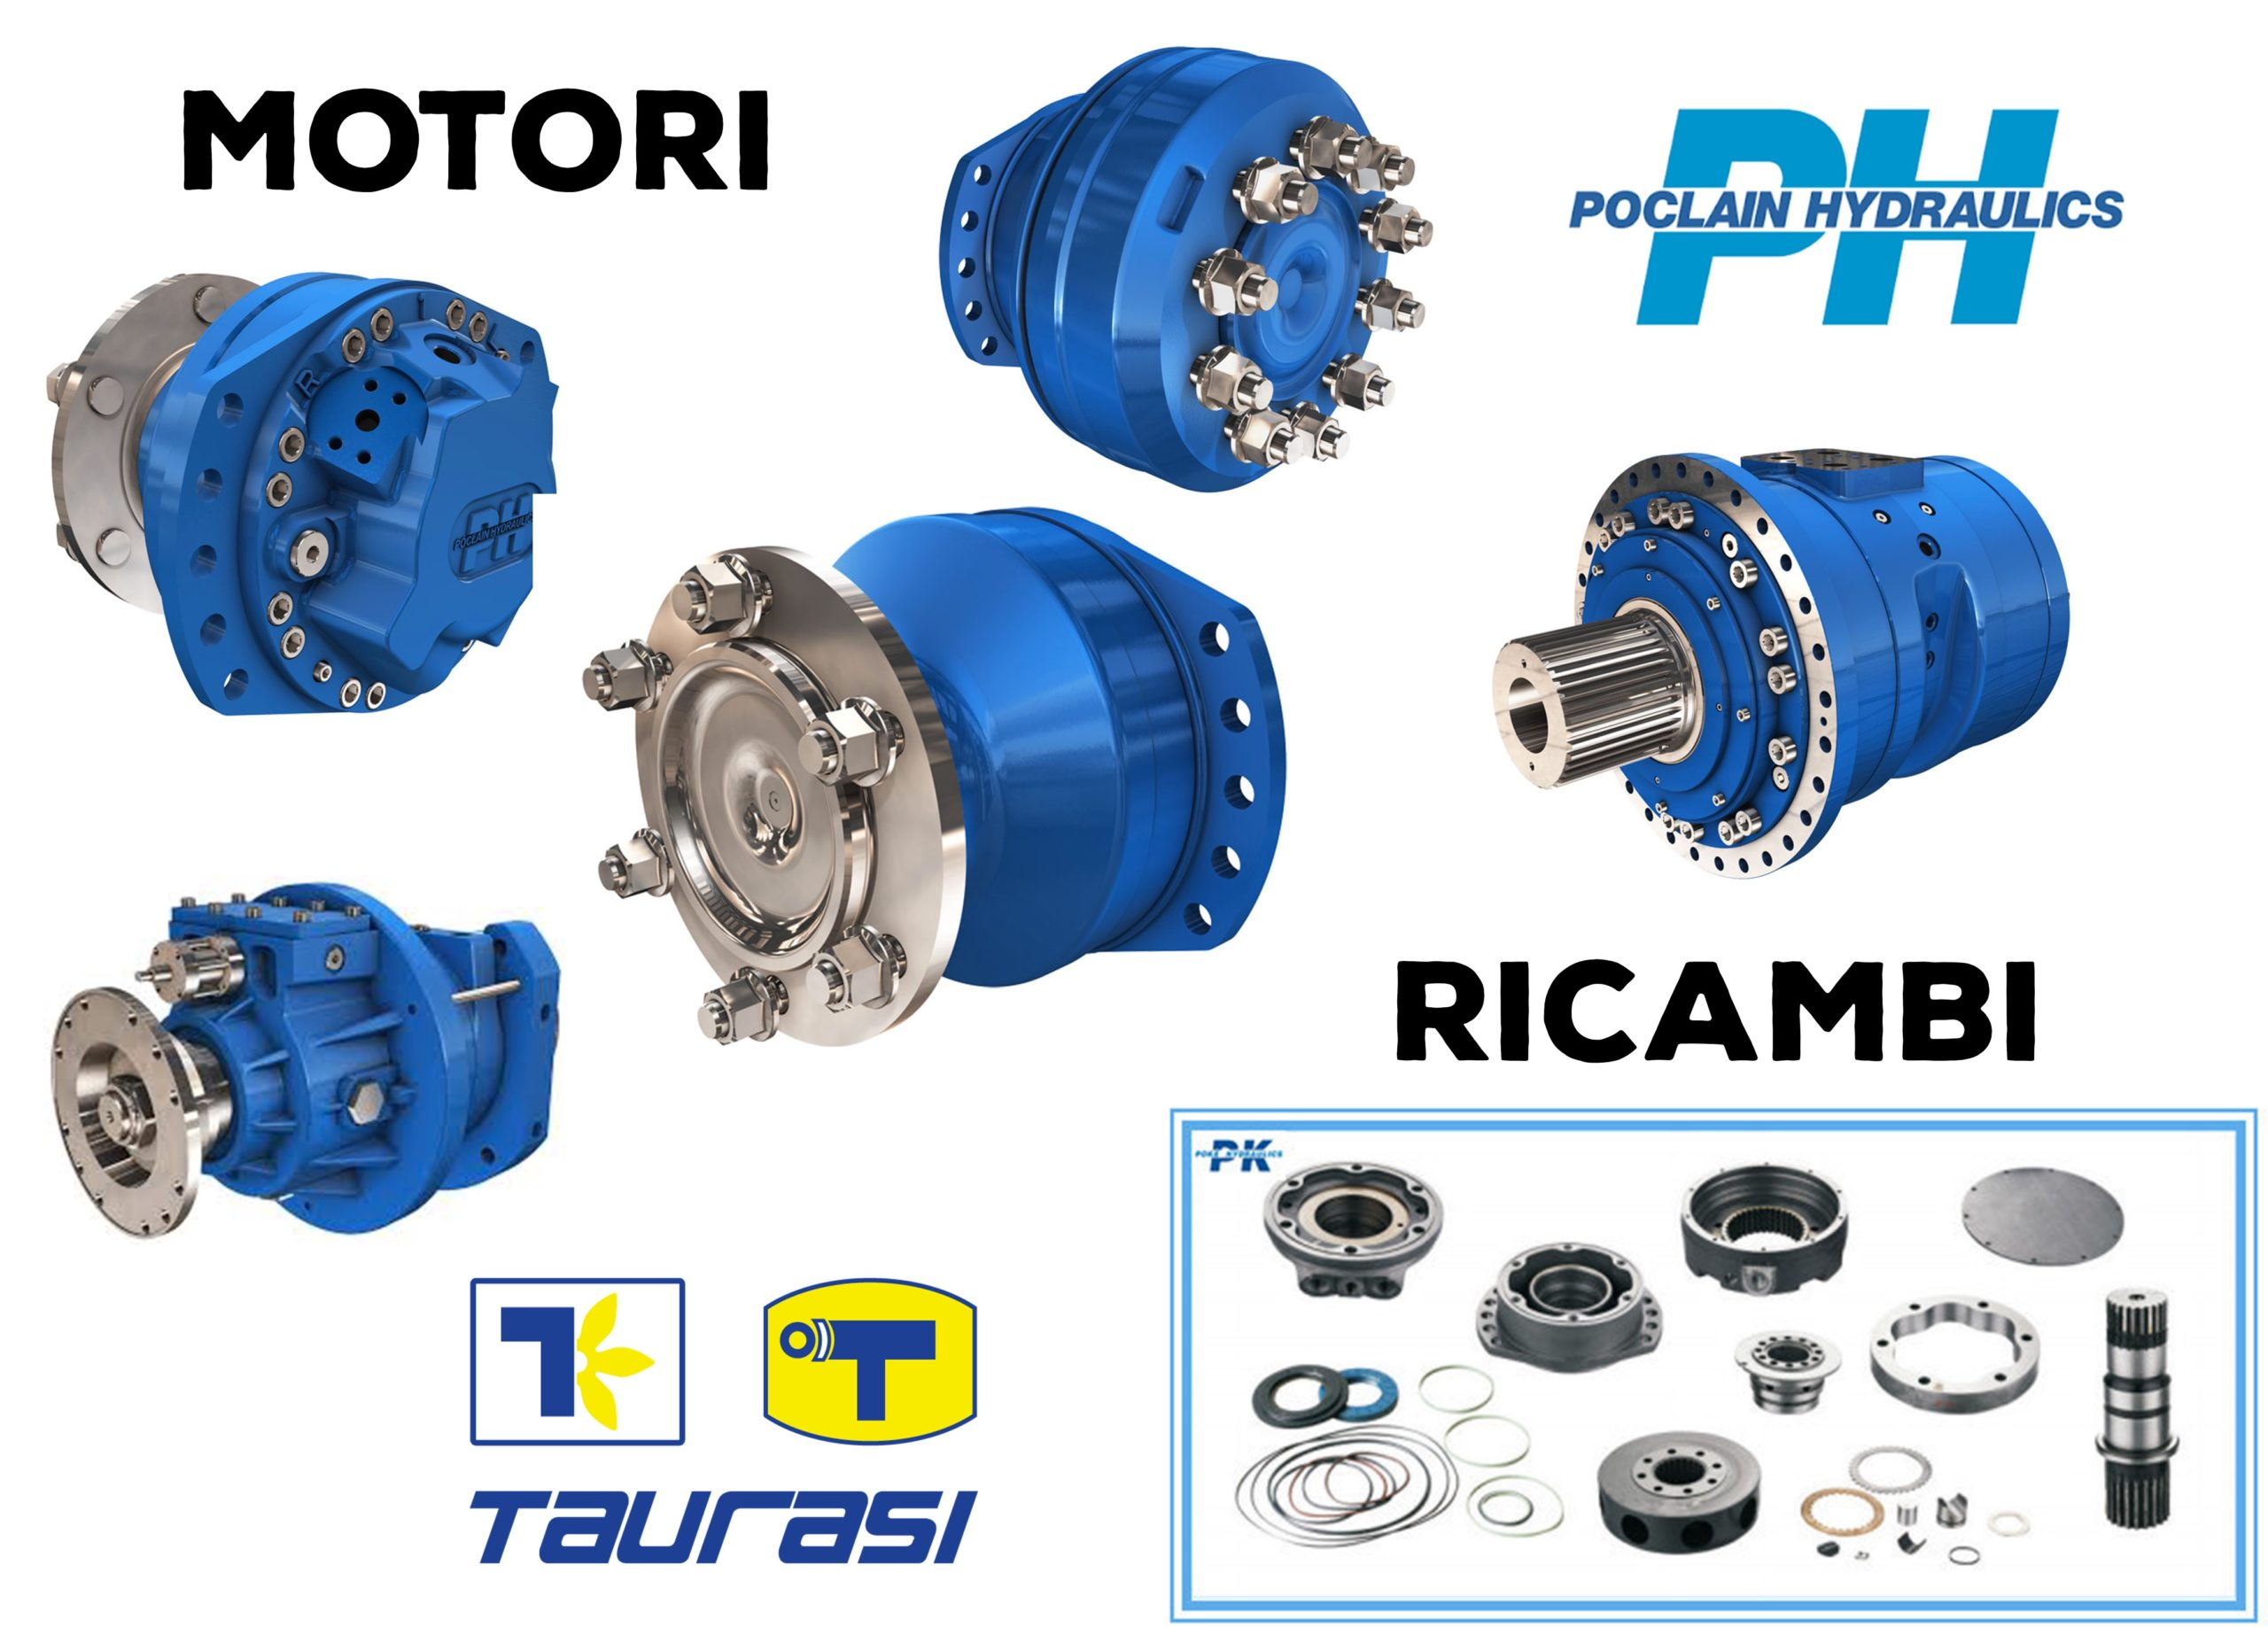 Ricambi e Motori PH Poclain Hydraulics